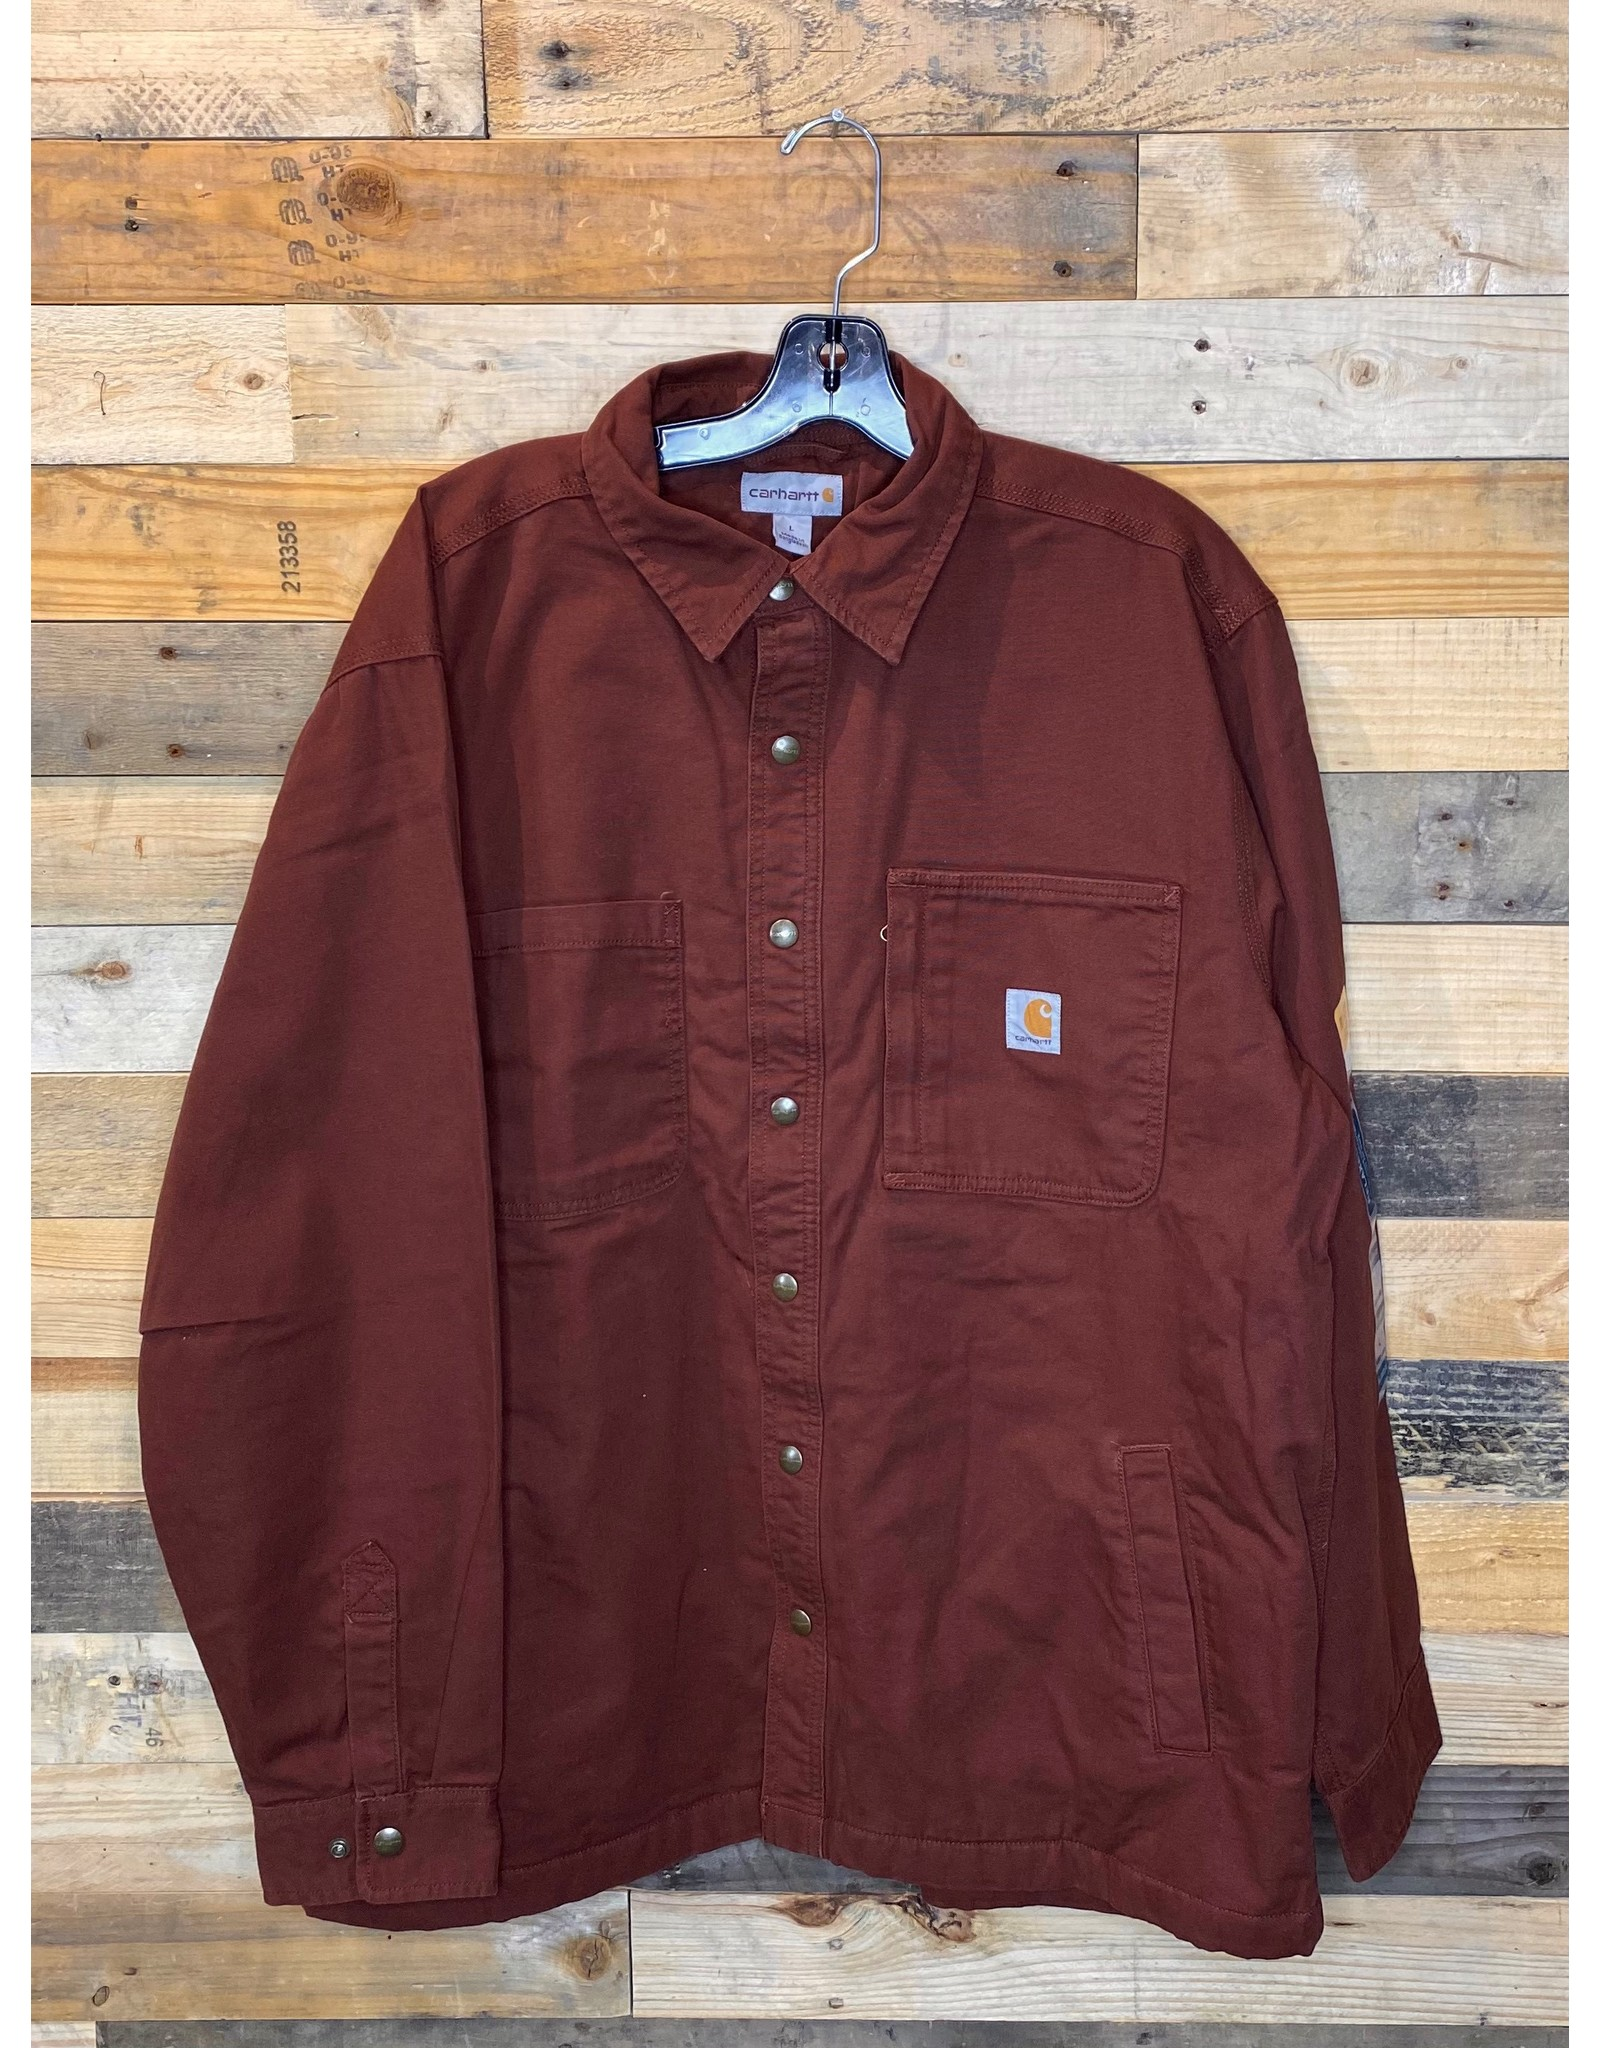 Carhartt Canvas Shirt Jacket